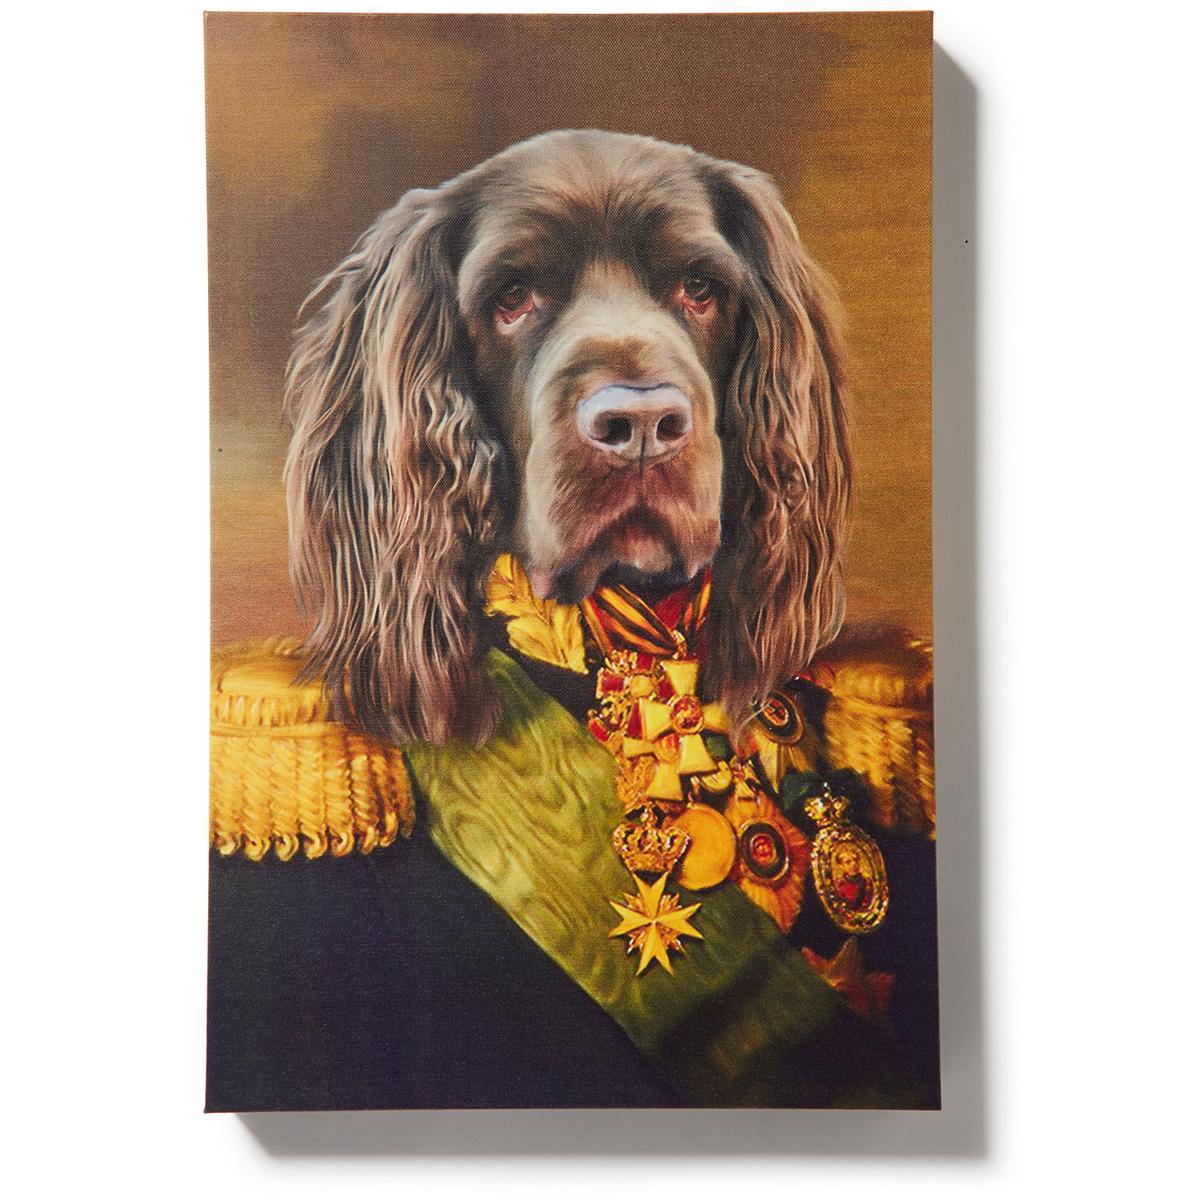 Crown & Paw dog portrait